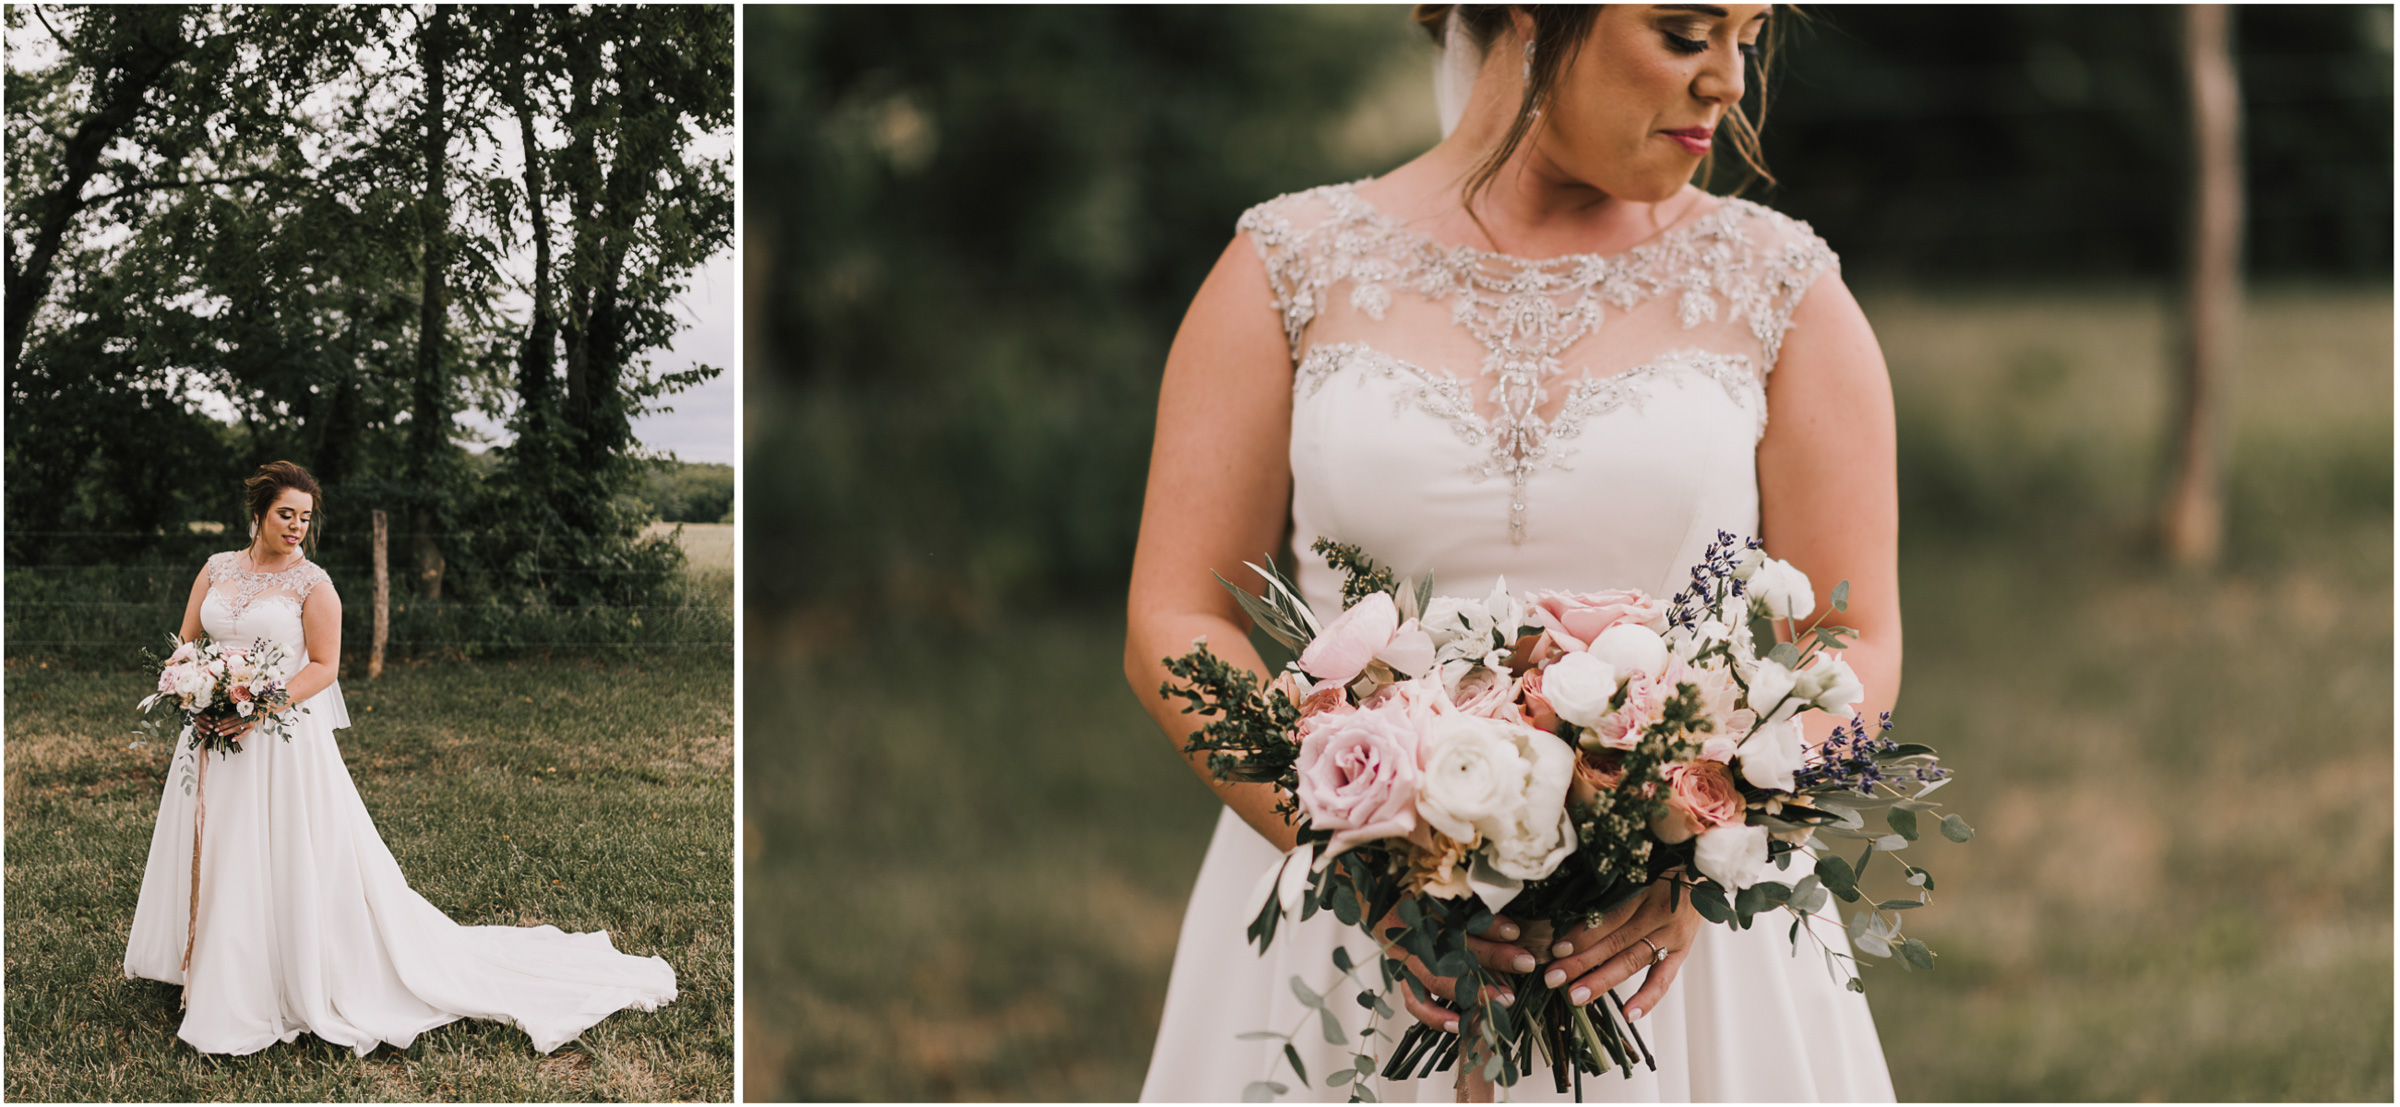 alyssa barletter photography summer odessa missouri wedding kansas city photographer-35.jpg